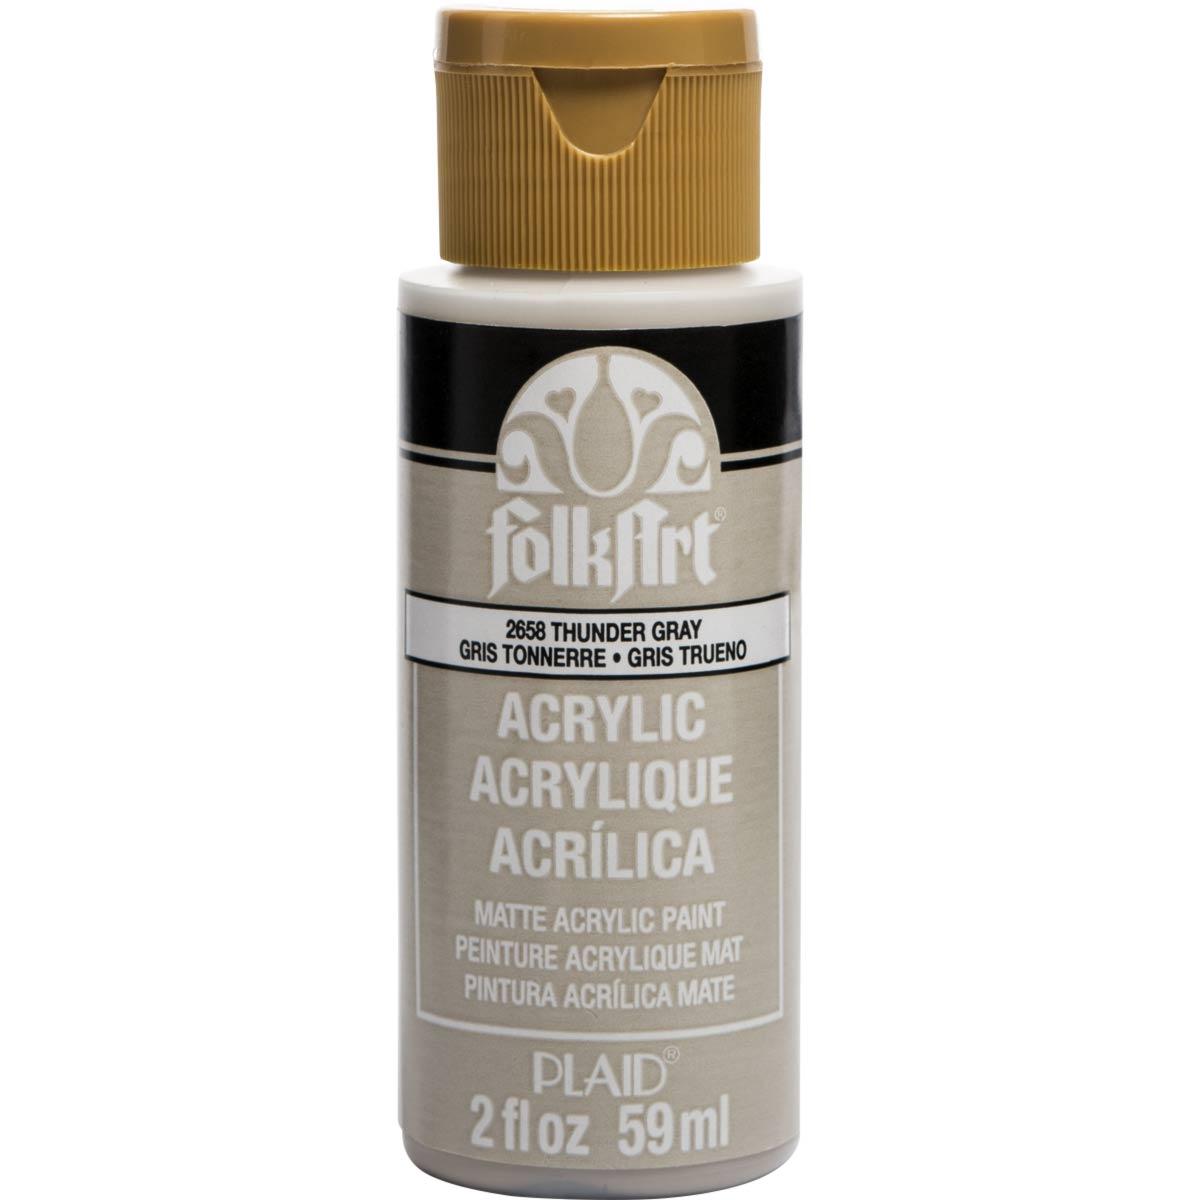 FolkArt ® Acrylic Colors - Thunder Gray, 2 oz.